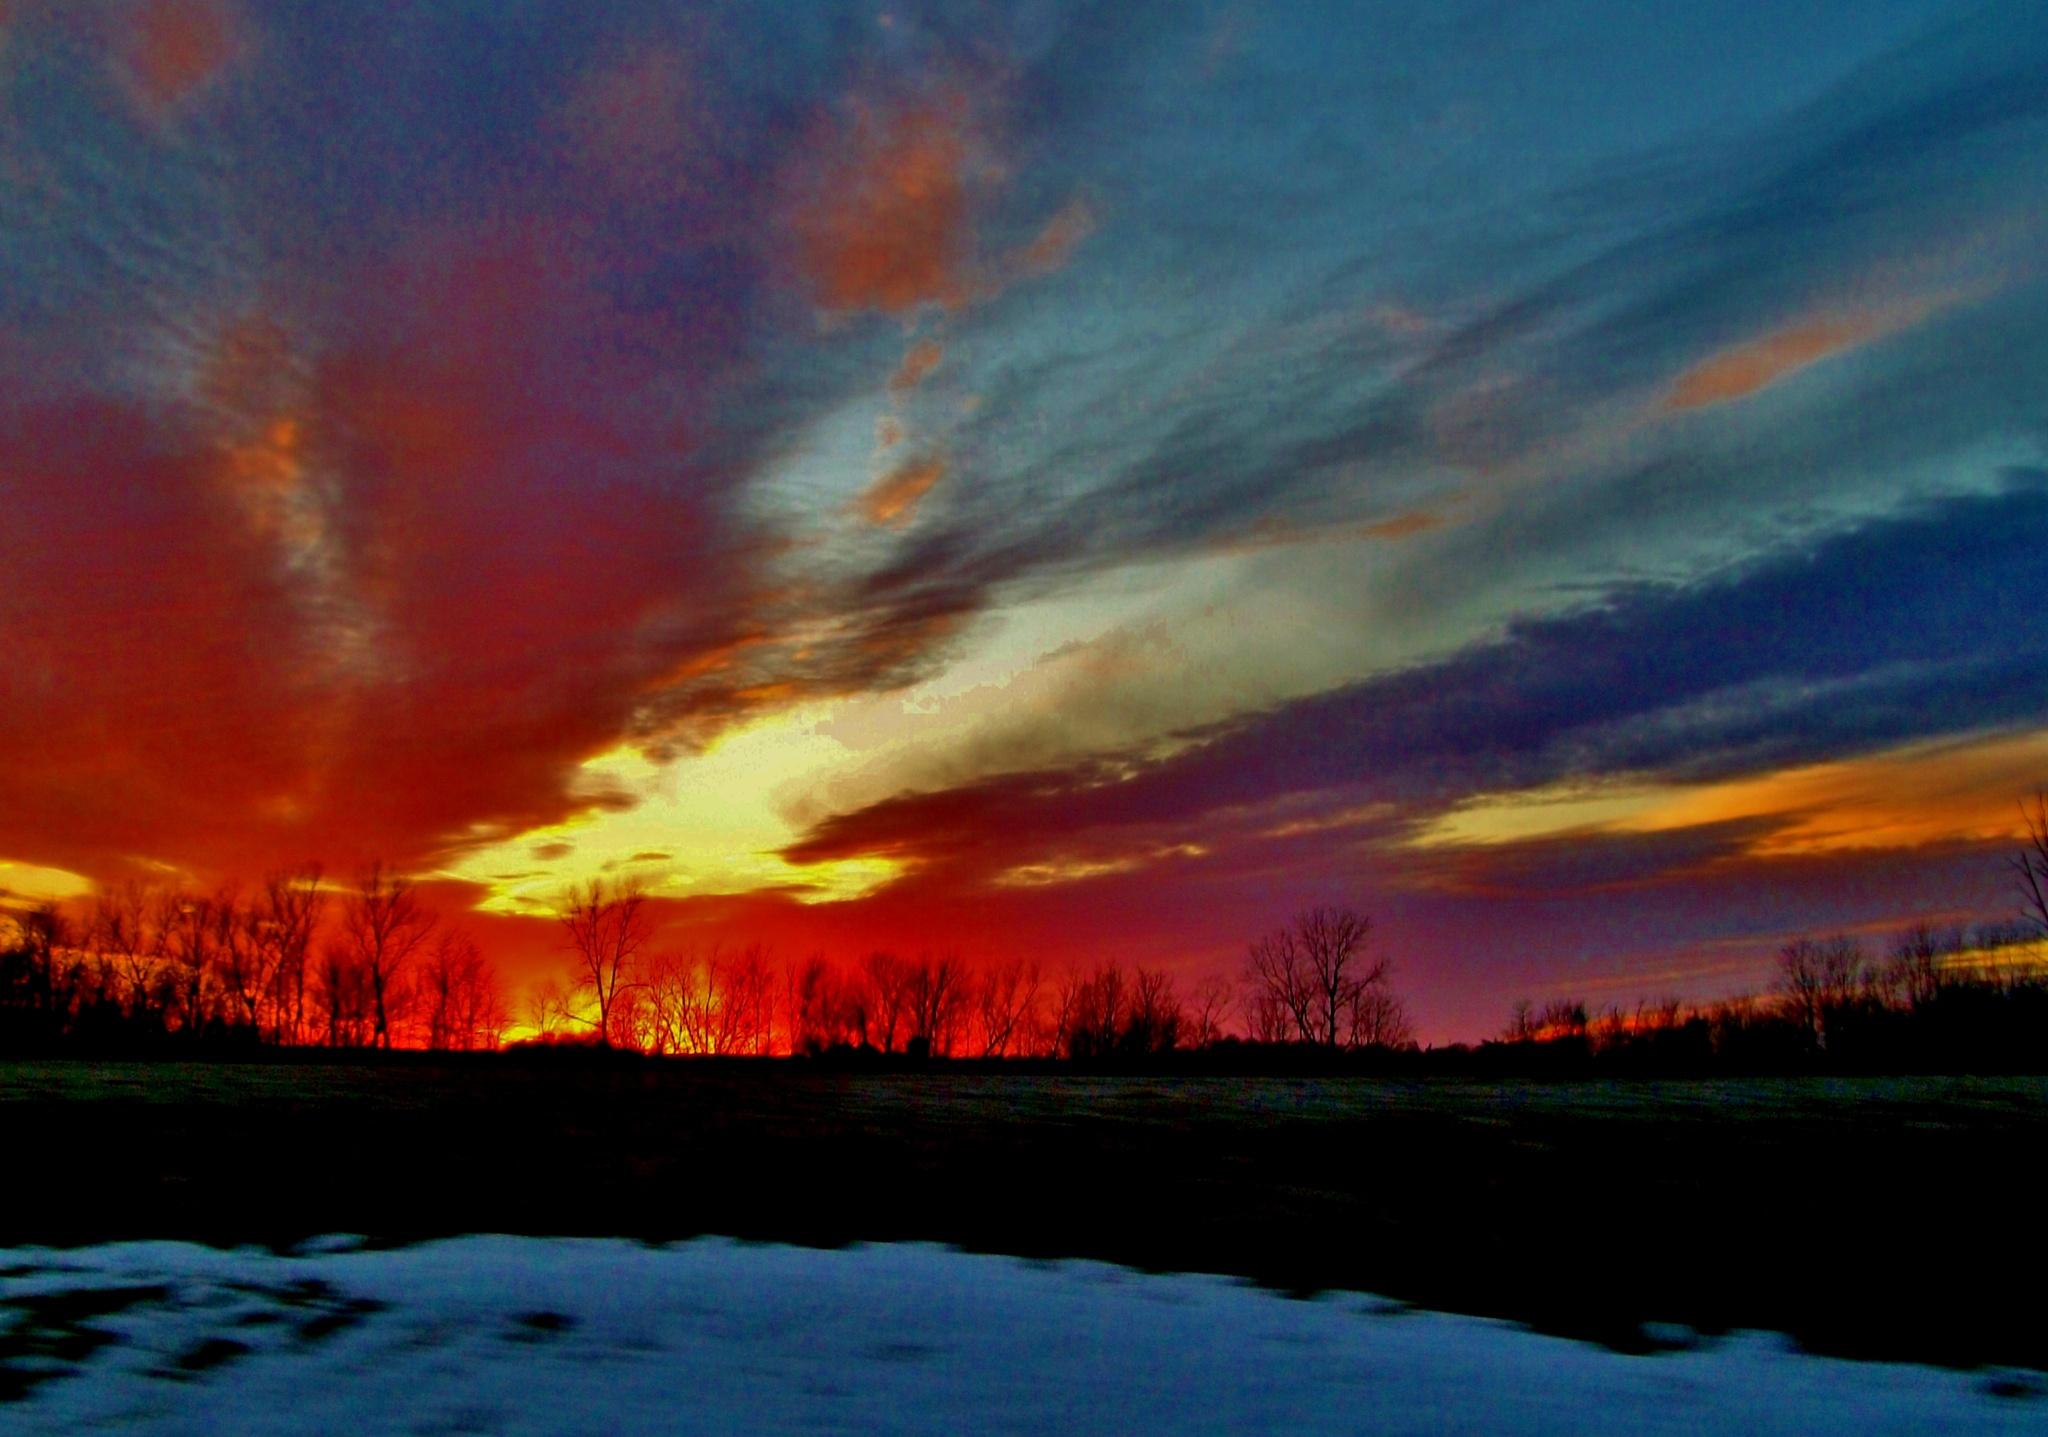 Winter sunset by debbylesko